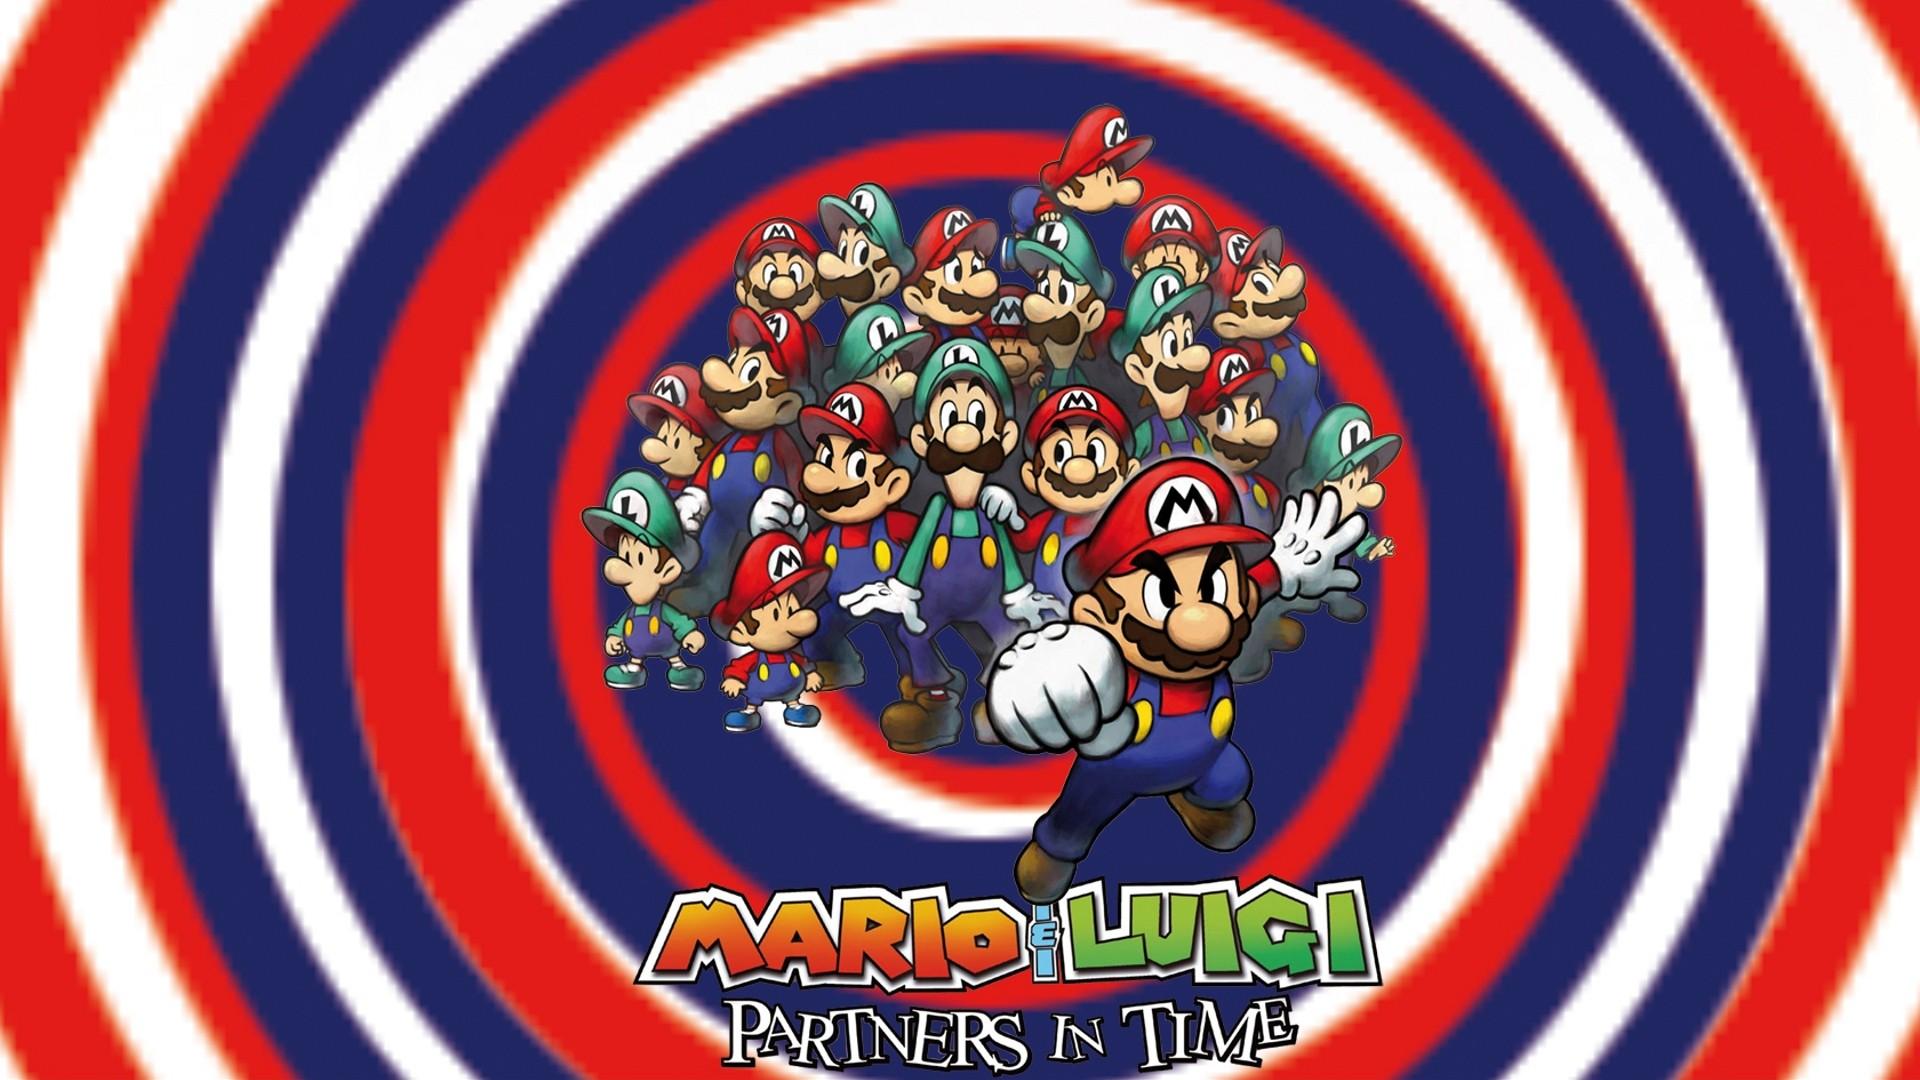 Mario And Luigi Wallpaper Hd 64 Images